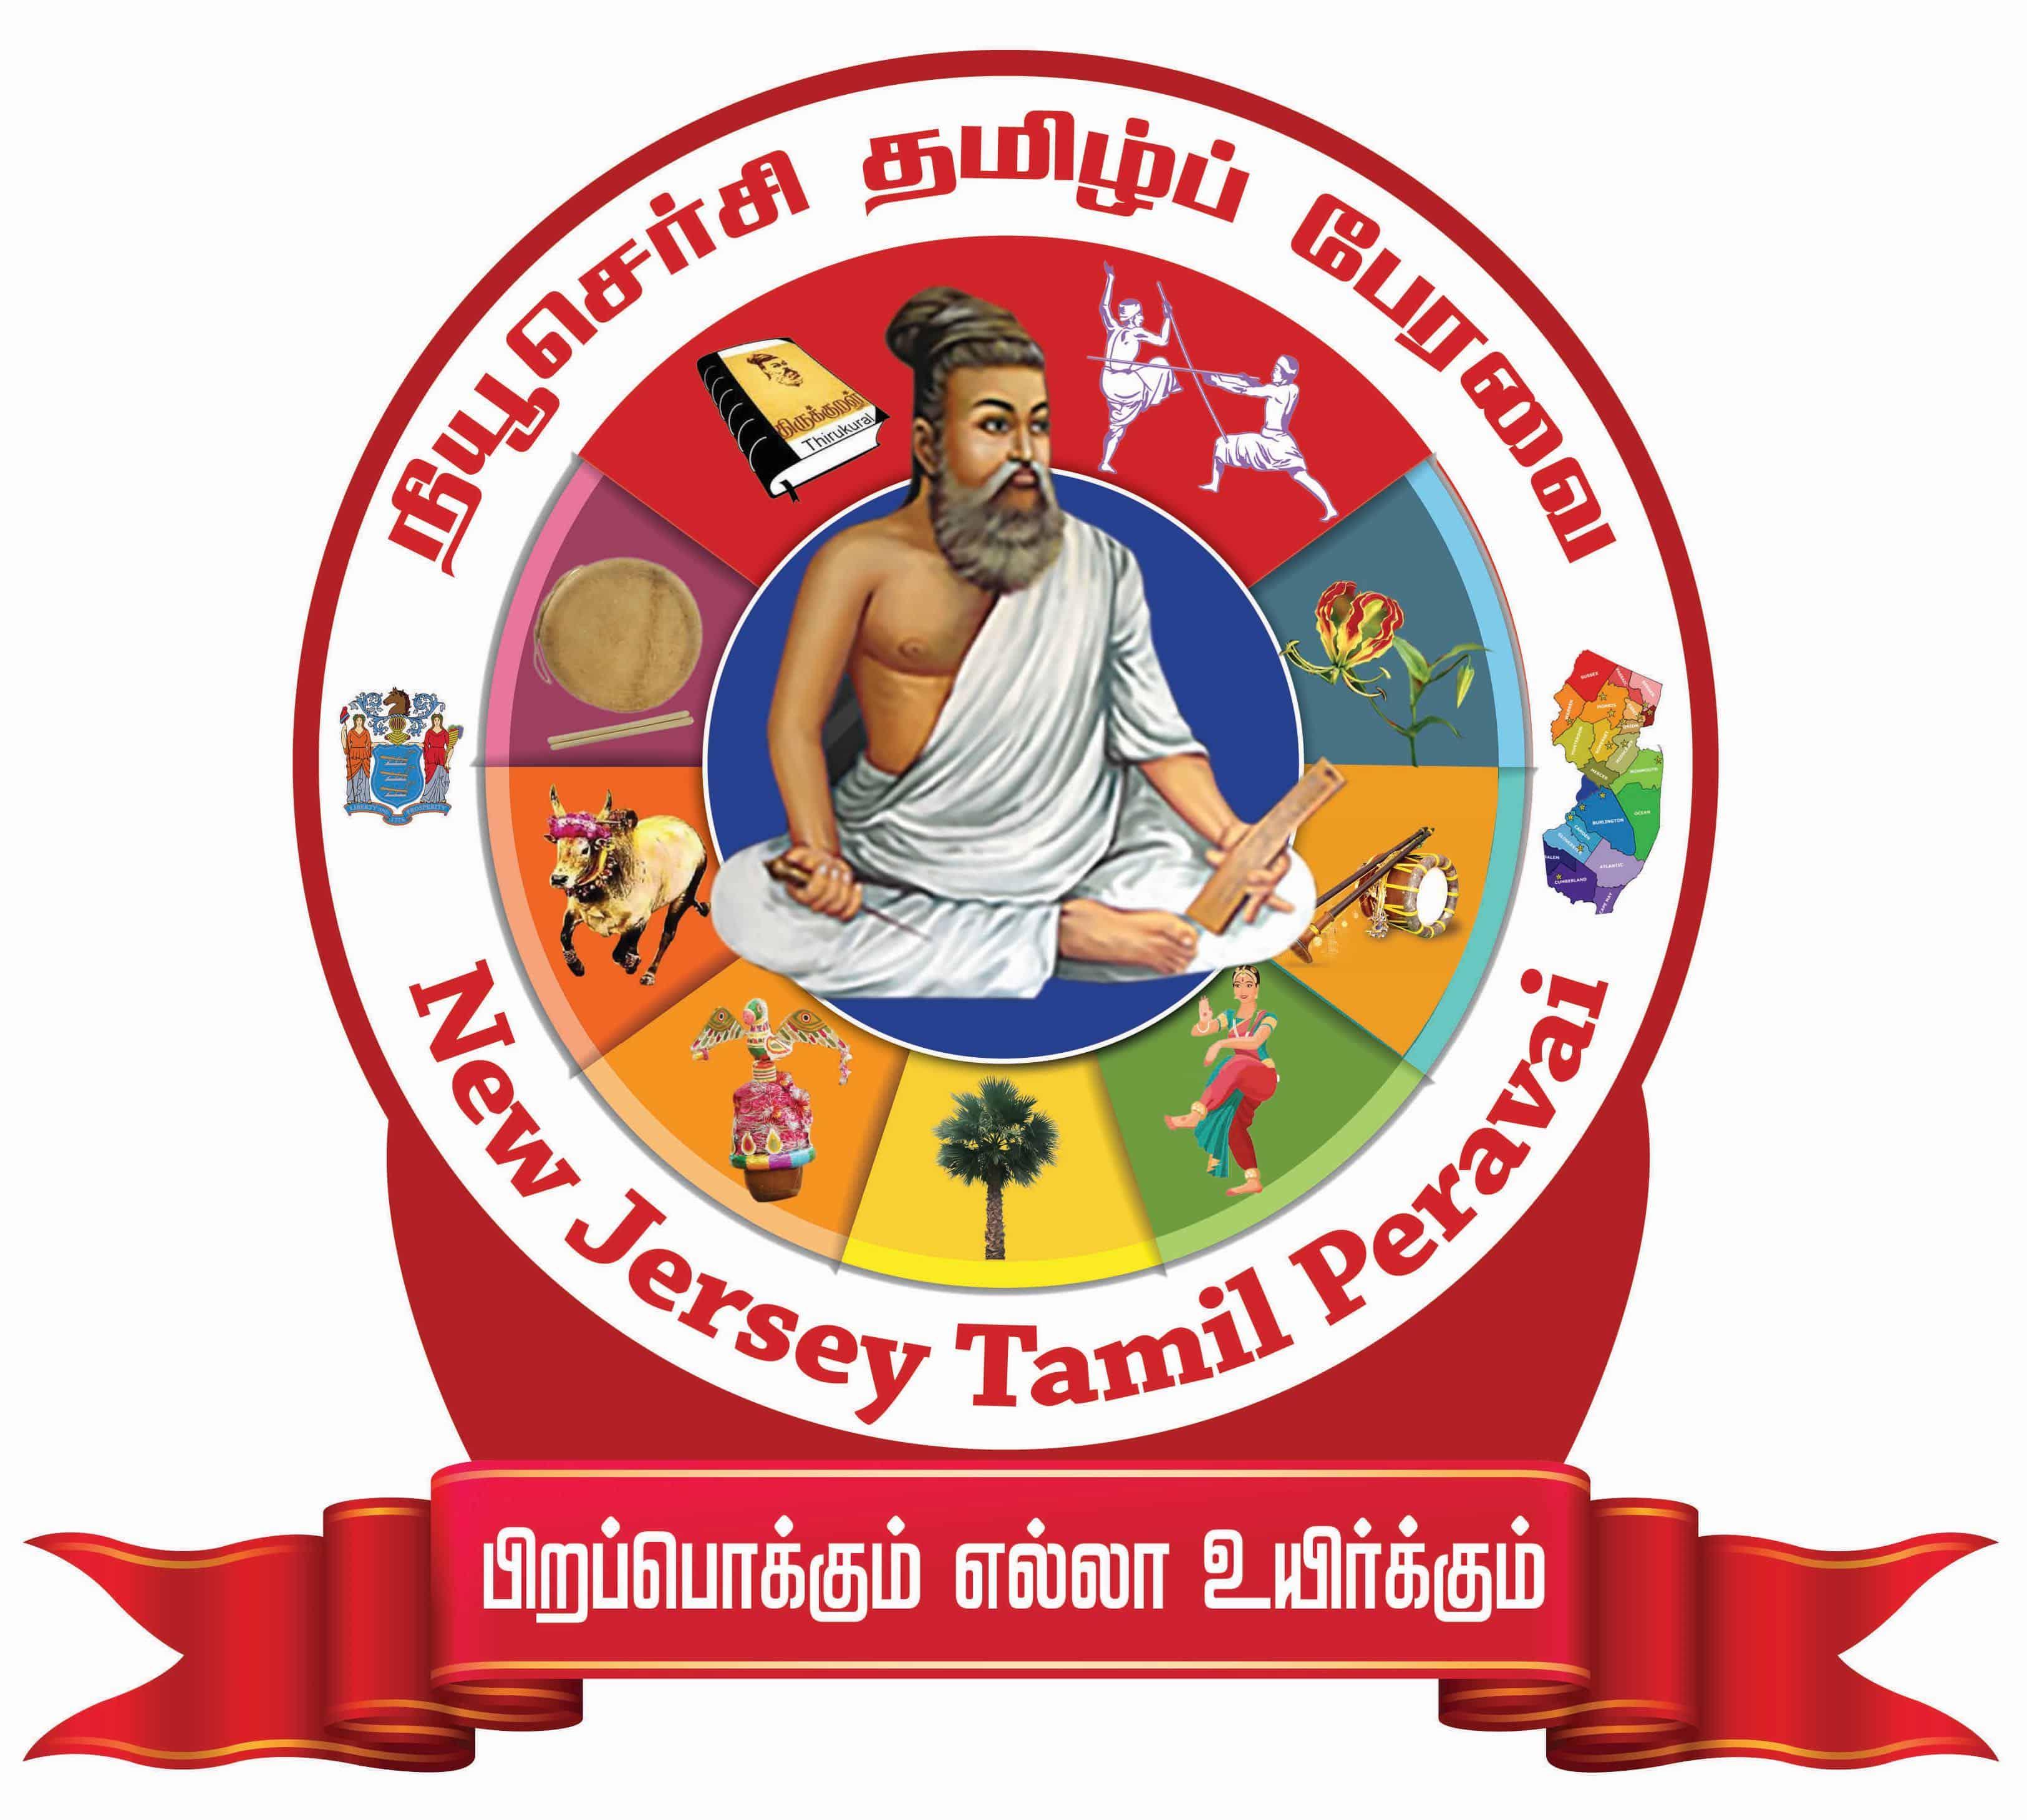 NJ Tamil Peravai (NJTaP)